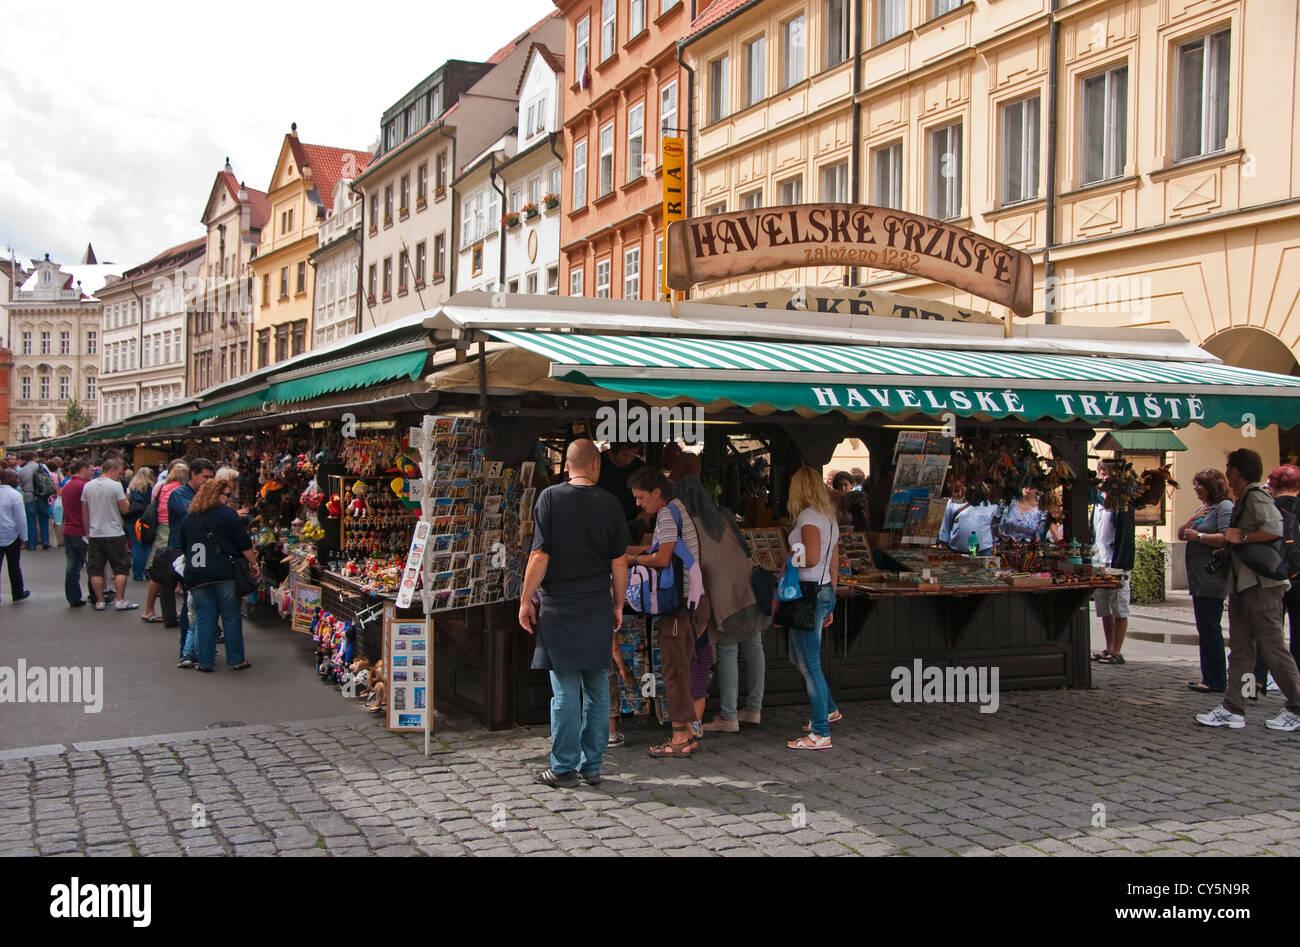 Havelske trziste havel 39 s market in prague city centre for Central prague